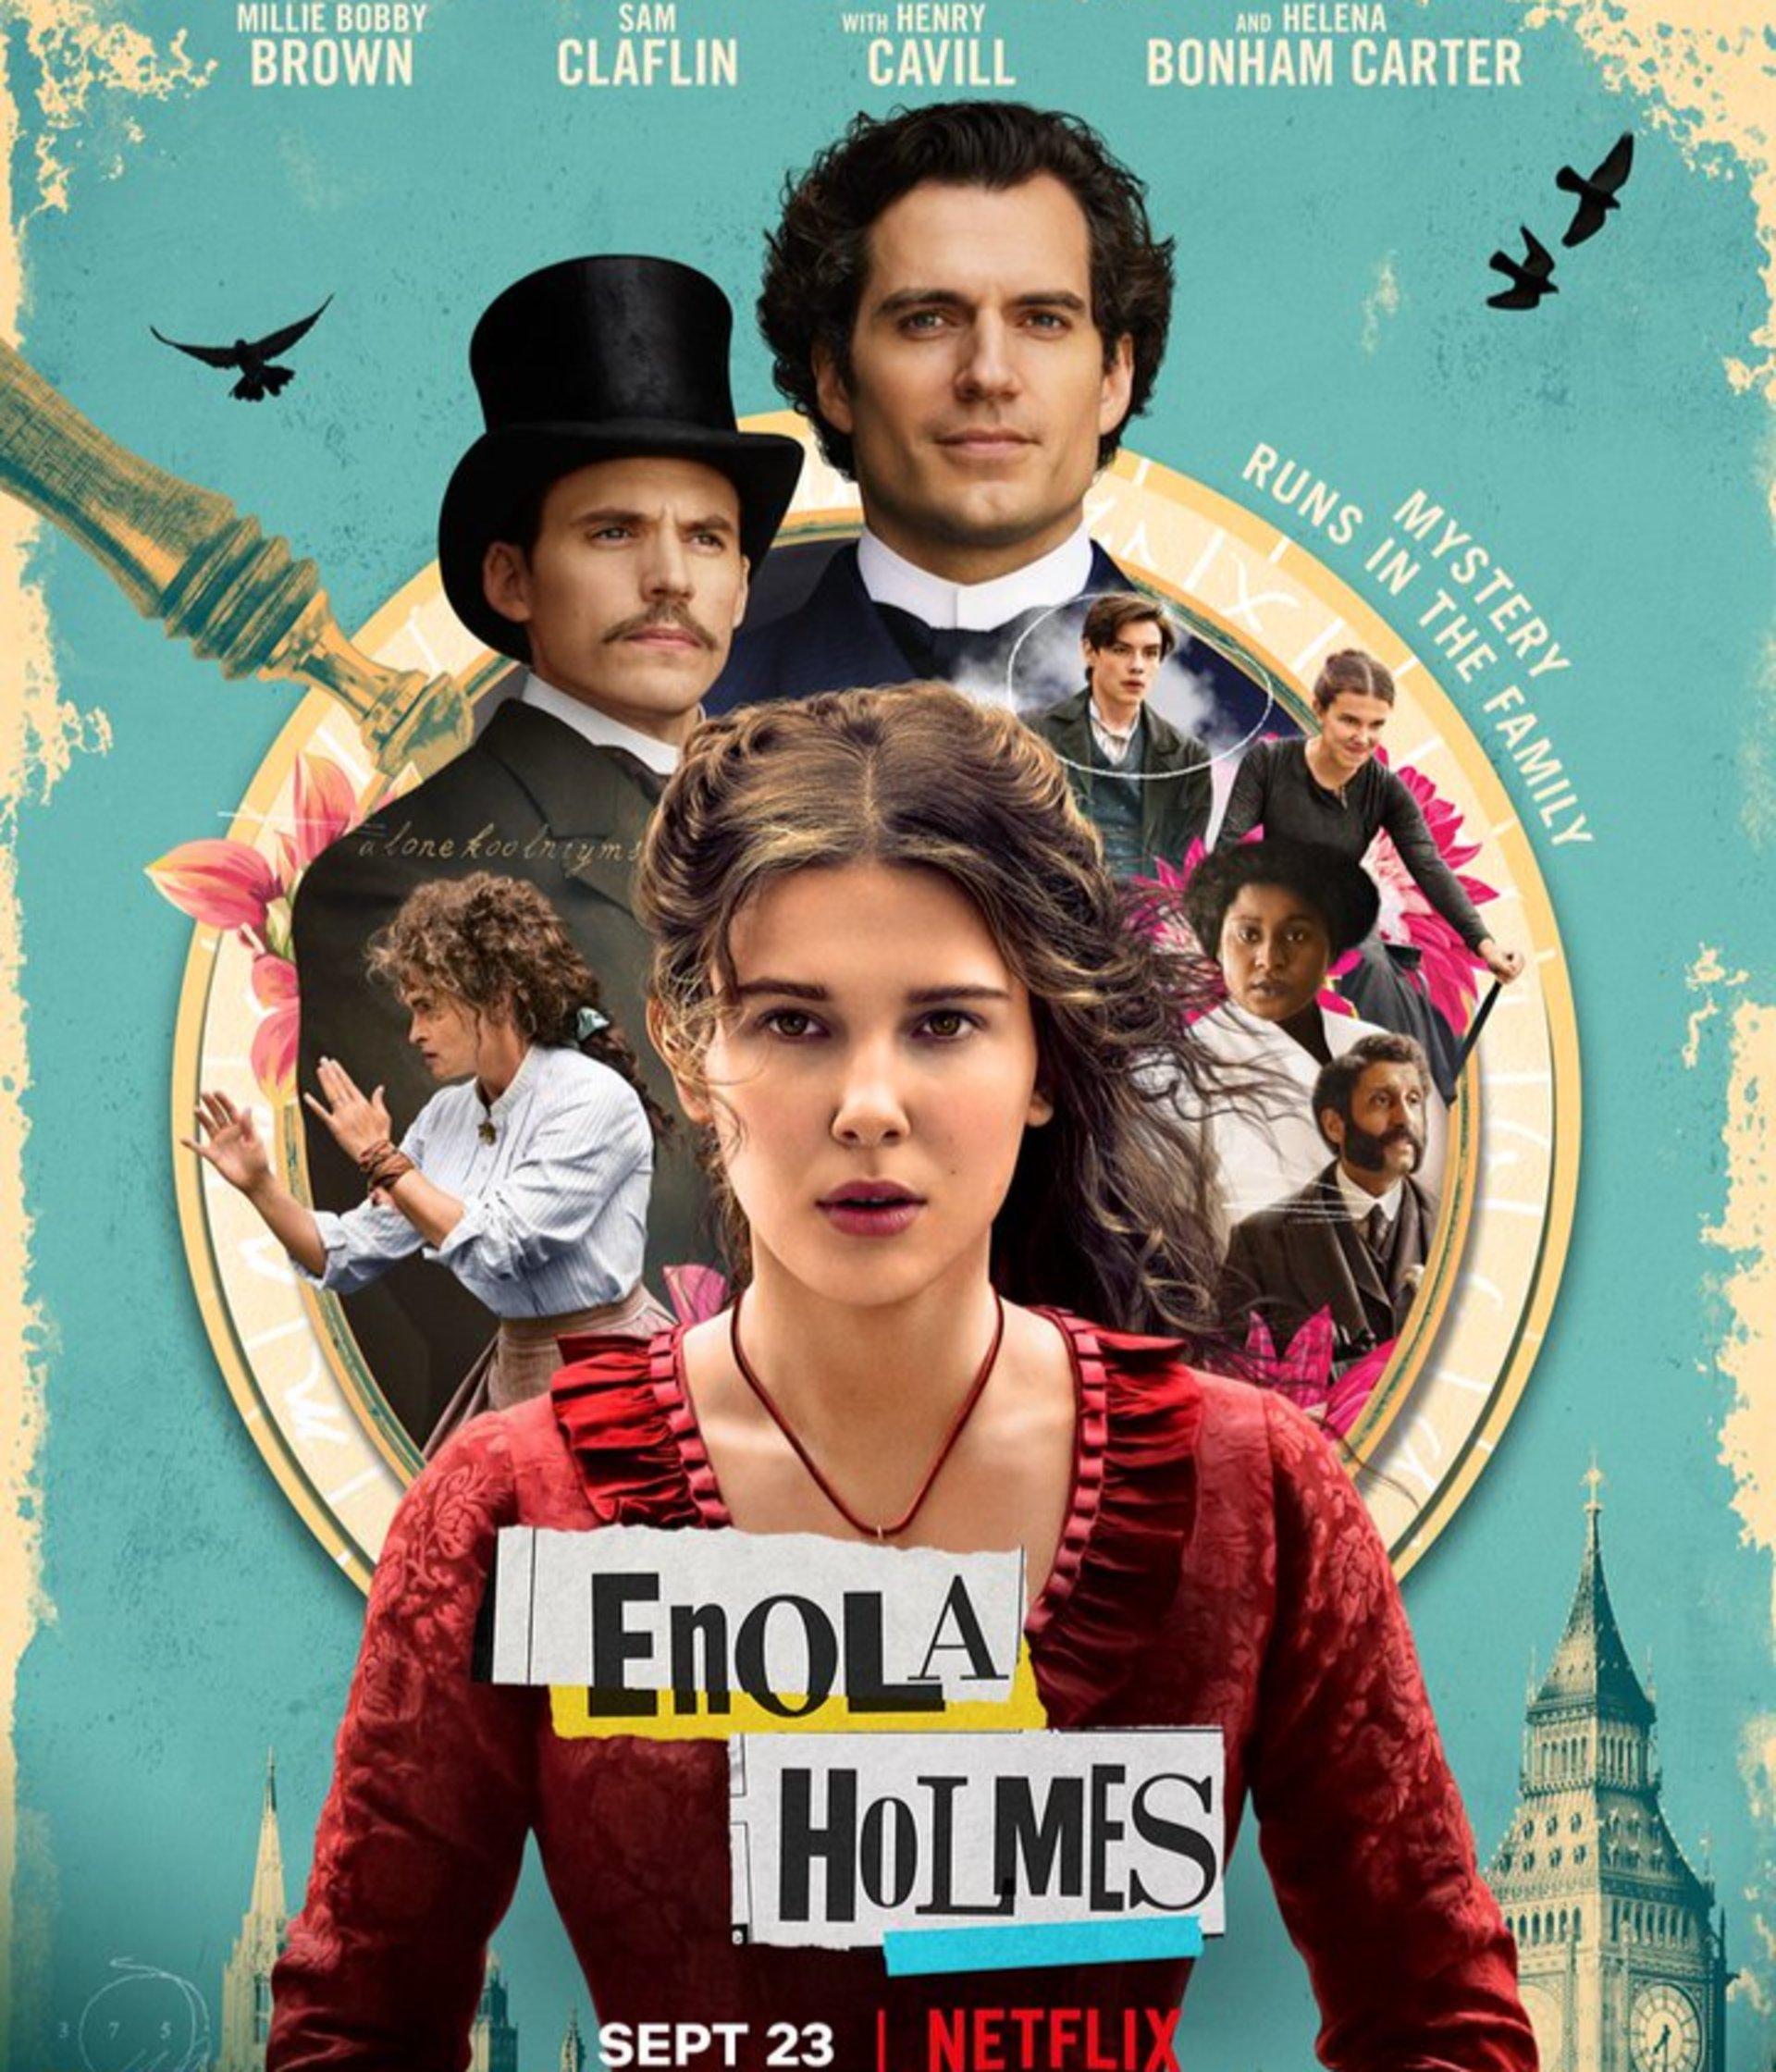 Nonton Film Enola Holmes (2020) Subtitle Indonesia | cnnxxi